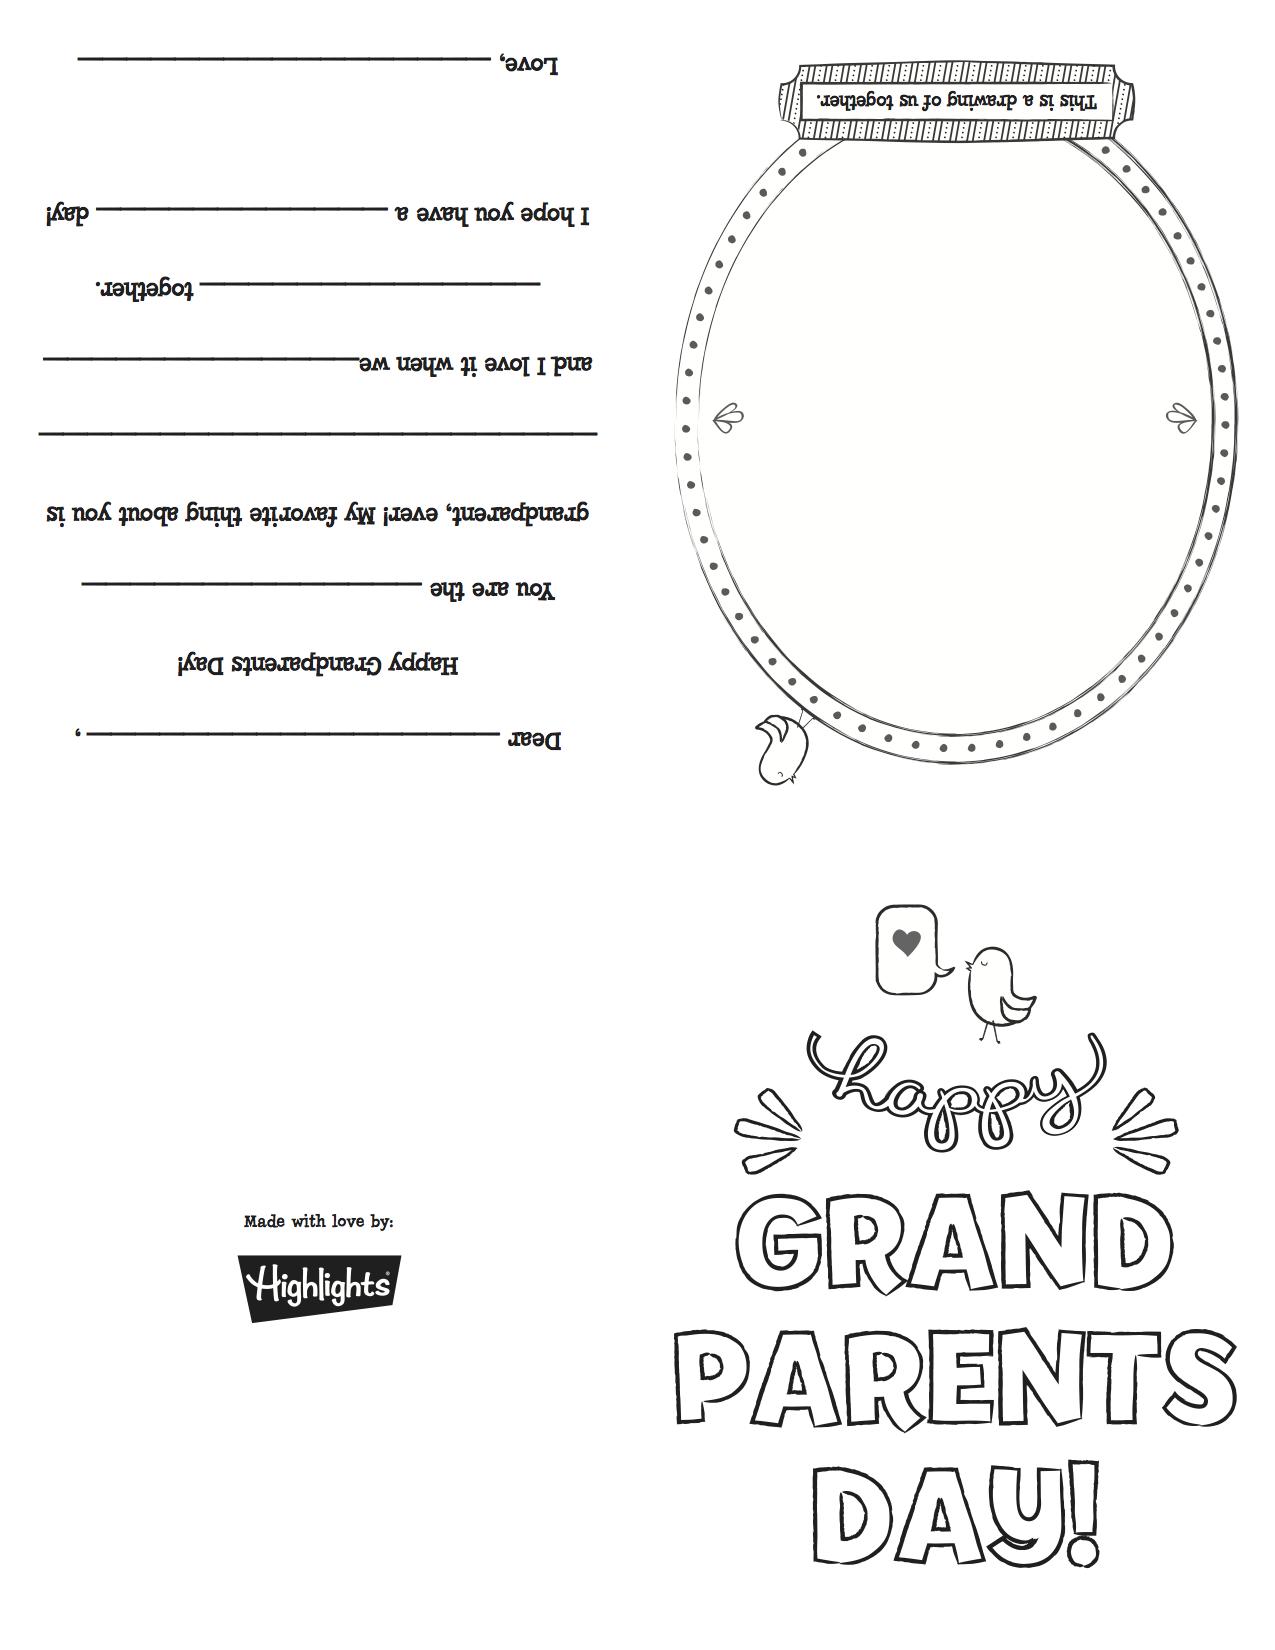 Grandparentsdaycard_Copy   Grandparents Day   Pinterest - Grandparents Day Cards Printable Free